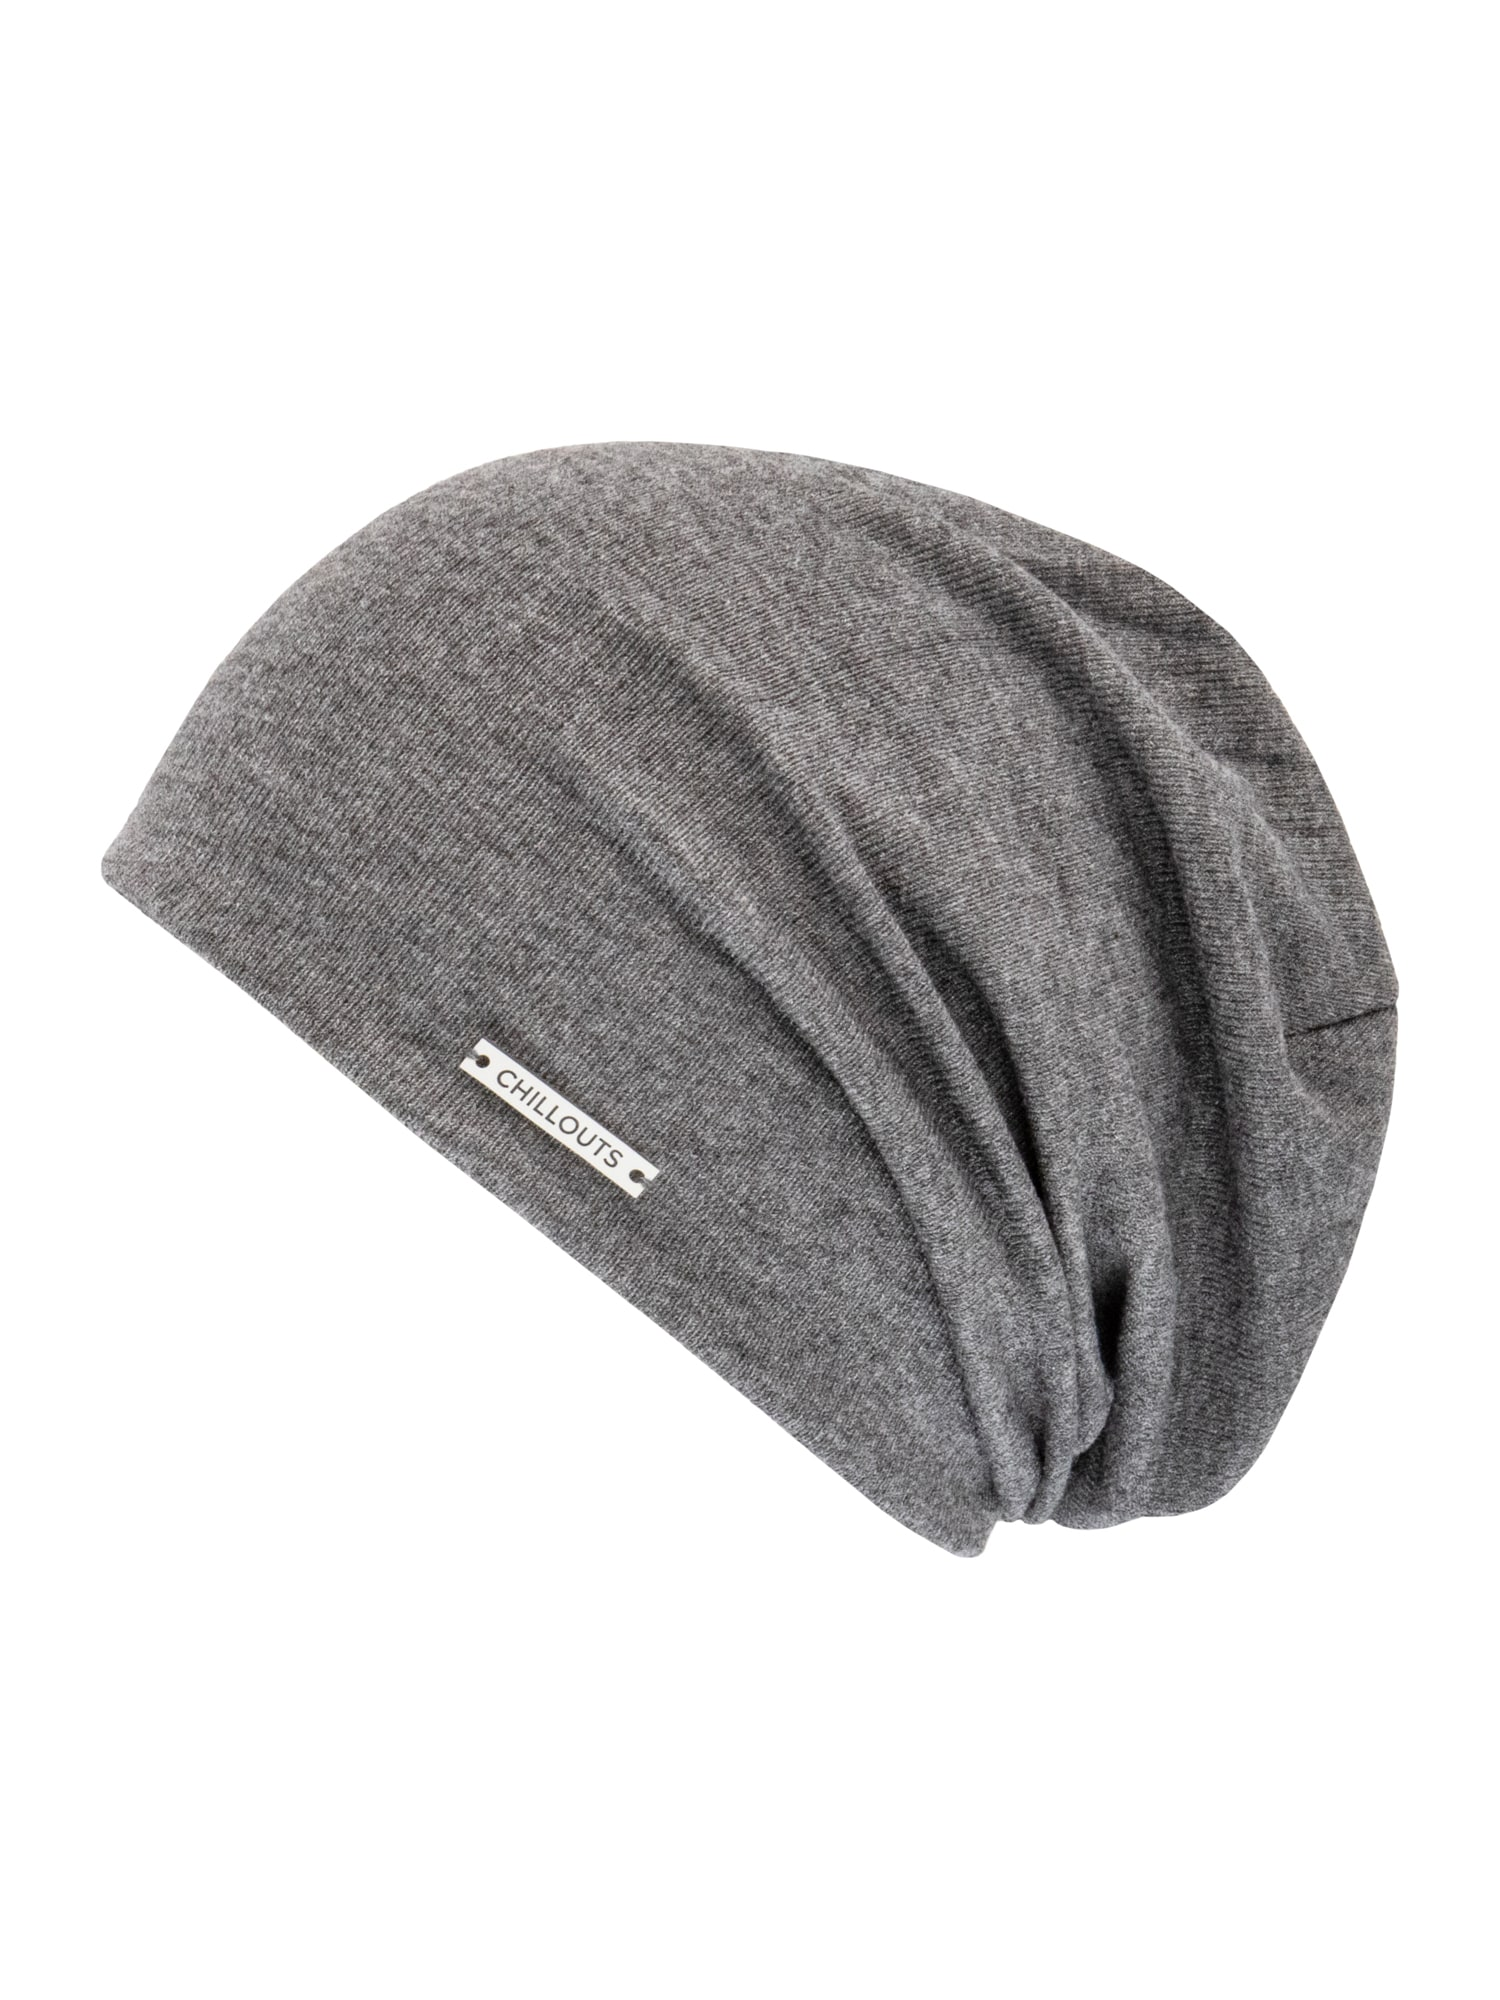 chillouts Megzta kepurė pilka